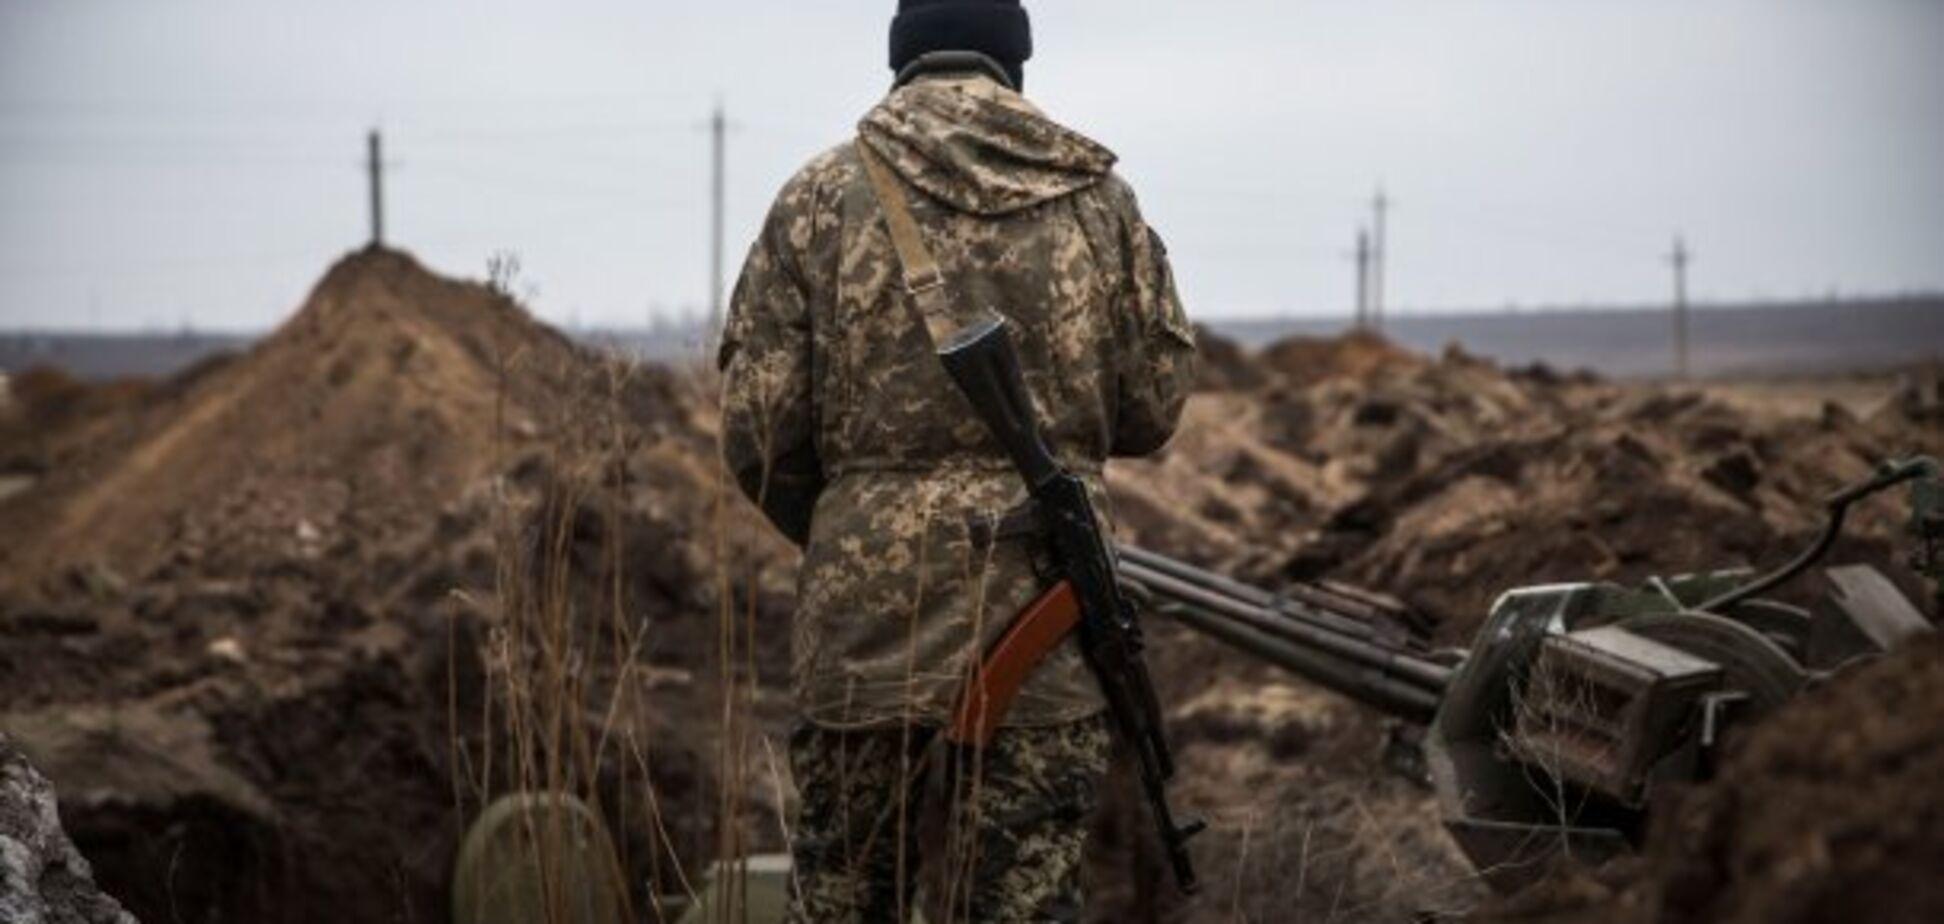 Перемирие сорвано: 'Л/ДНР' нагло напали на ВСУ